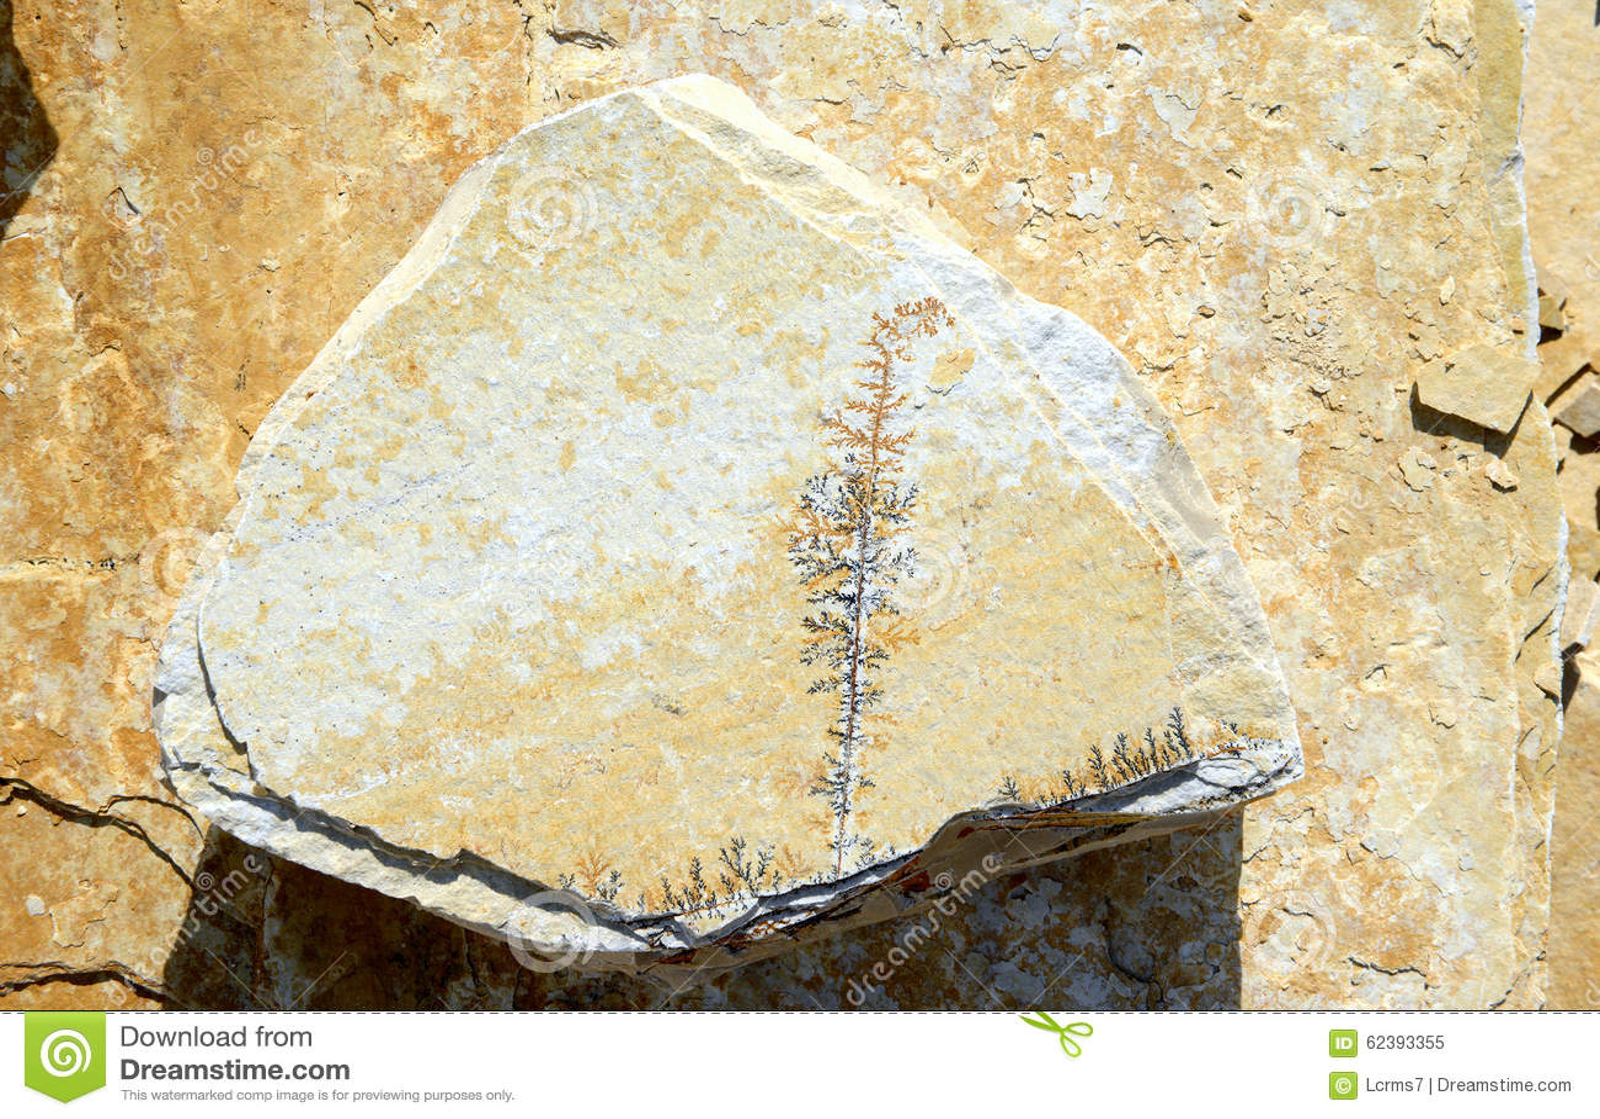 1000  images about fractalic dendrites: agates, cabochons, stones ...